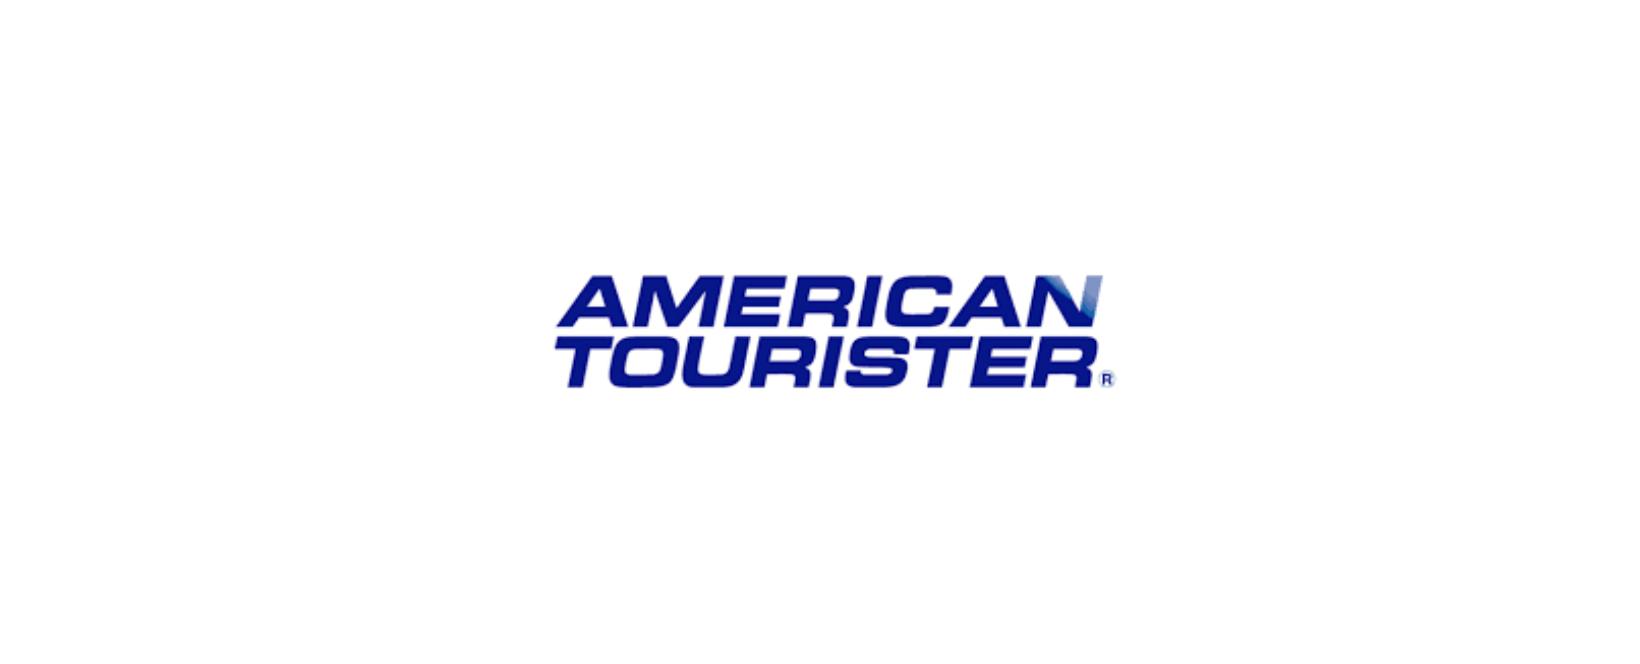 American Tourister UK Discount Code 2021